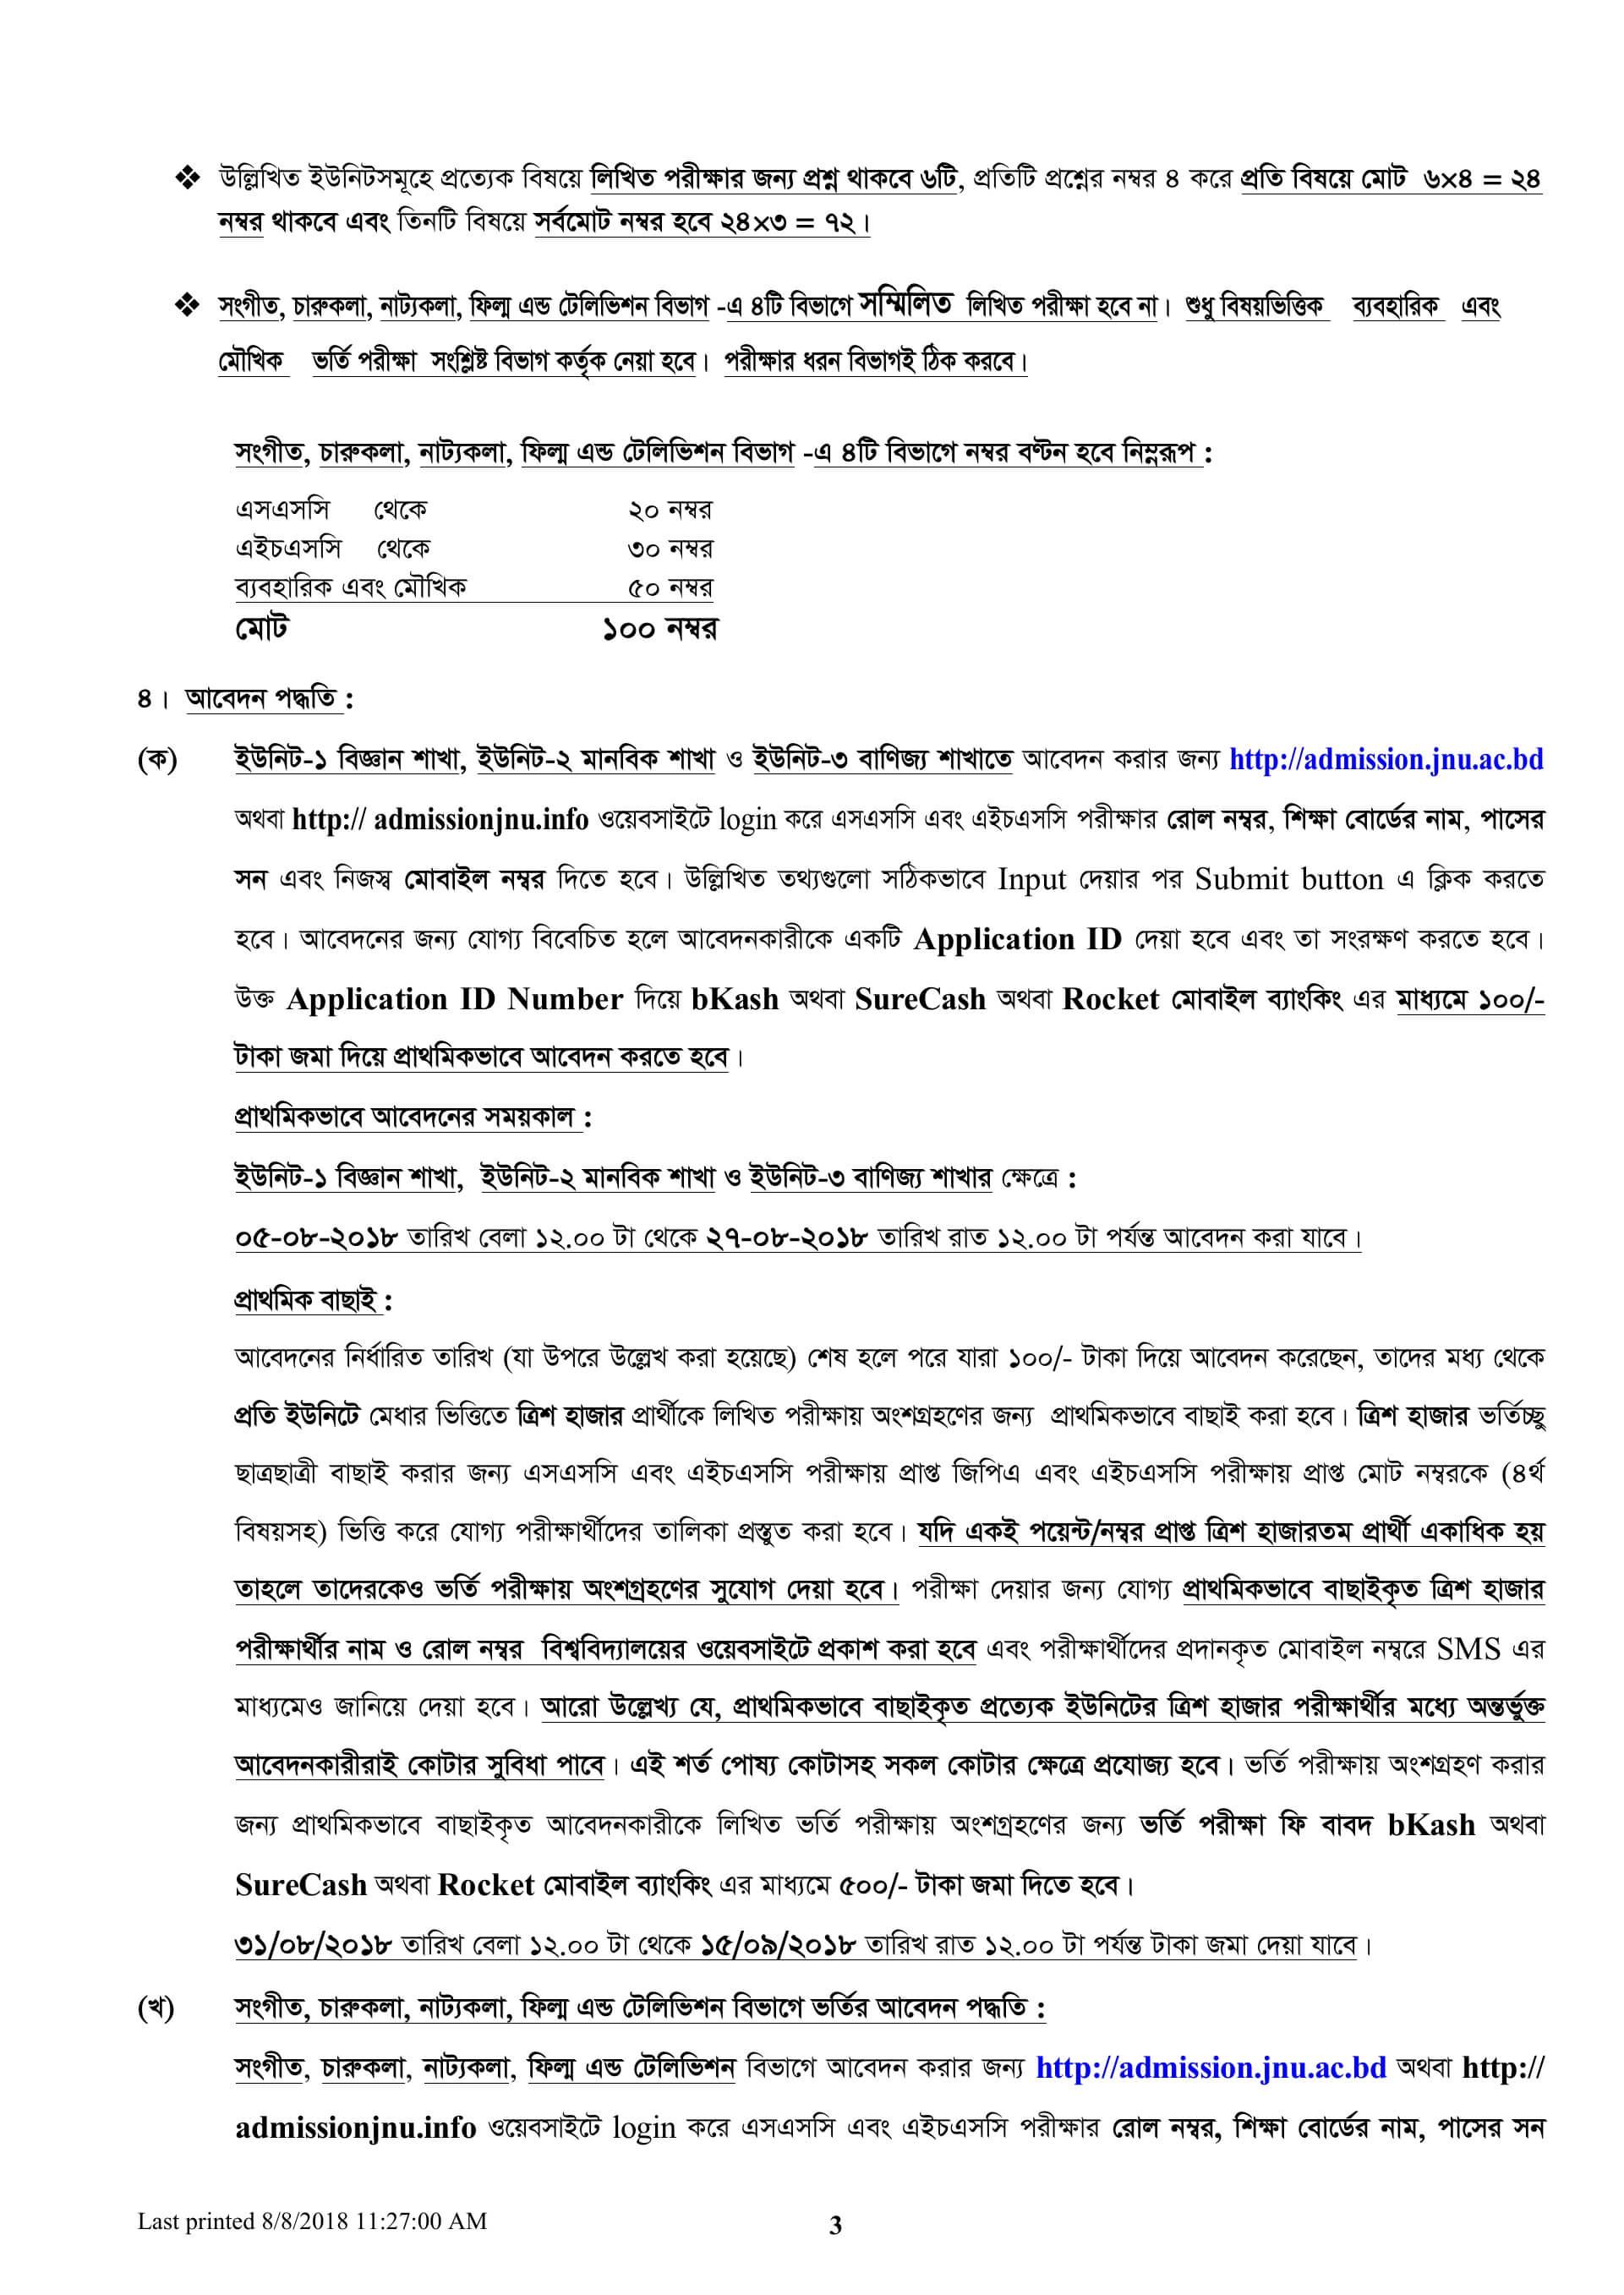 Jagannath University Admission Guideline-2